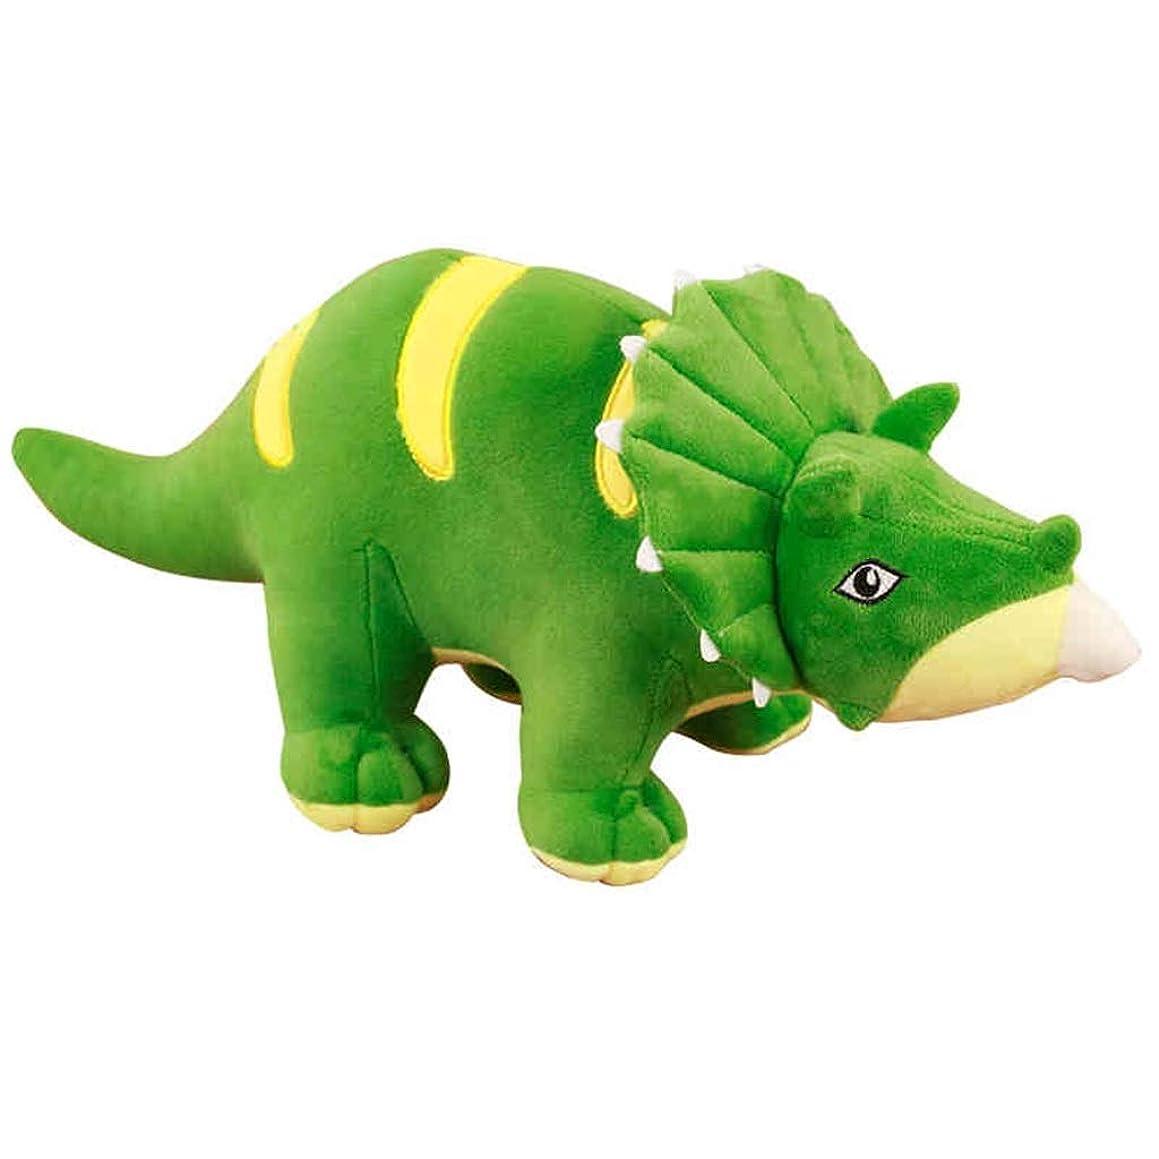 Plush Toys Plush Pillows Dinosaur Soft Toy Tyrannosaurus Doll Cute Dinosaur Children's Room Dinosaur Pillow Children's Bedroom Cartoon Toy Boy and Girl Birthday Present (Color : Green, Size : 95cm)